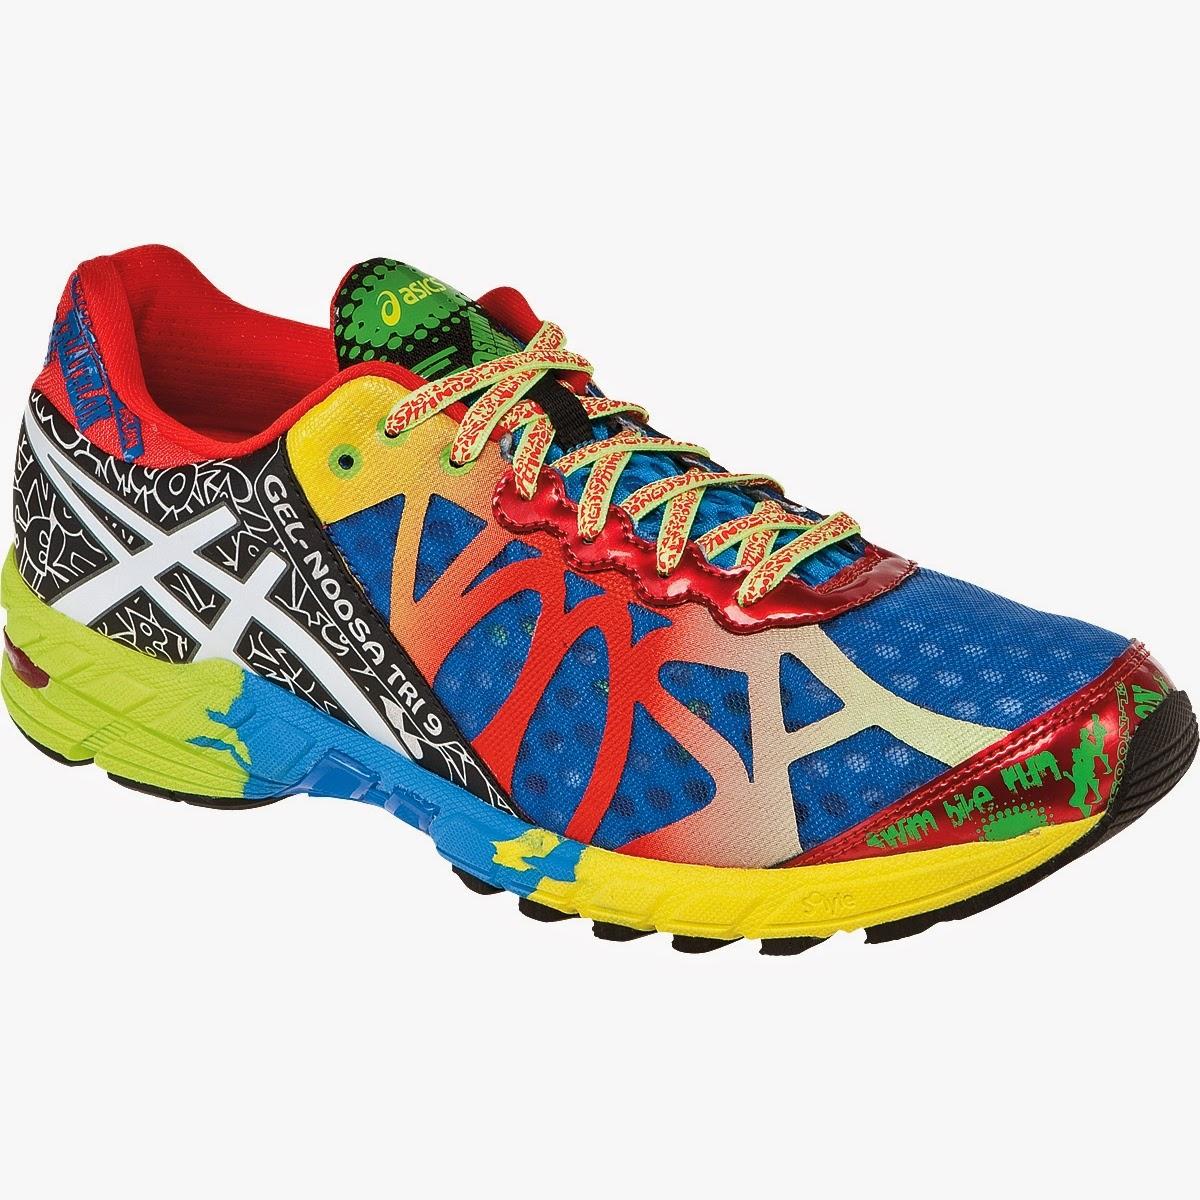 Asics Nimbus Shoe Review